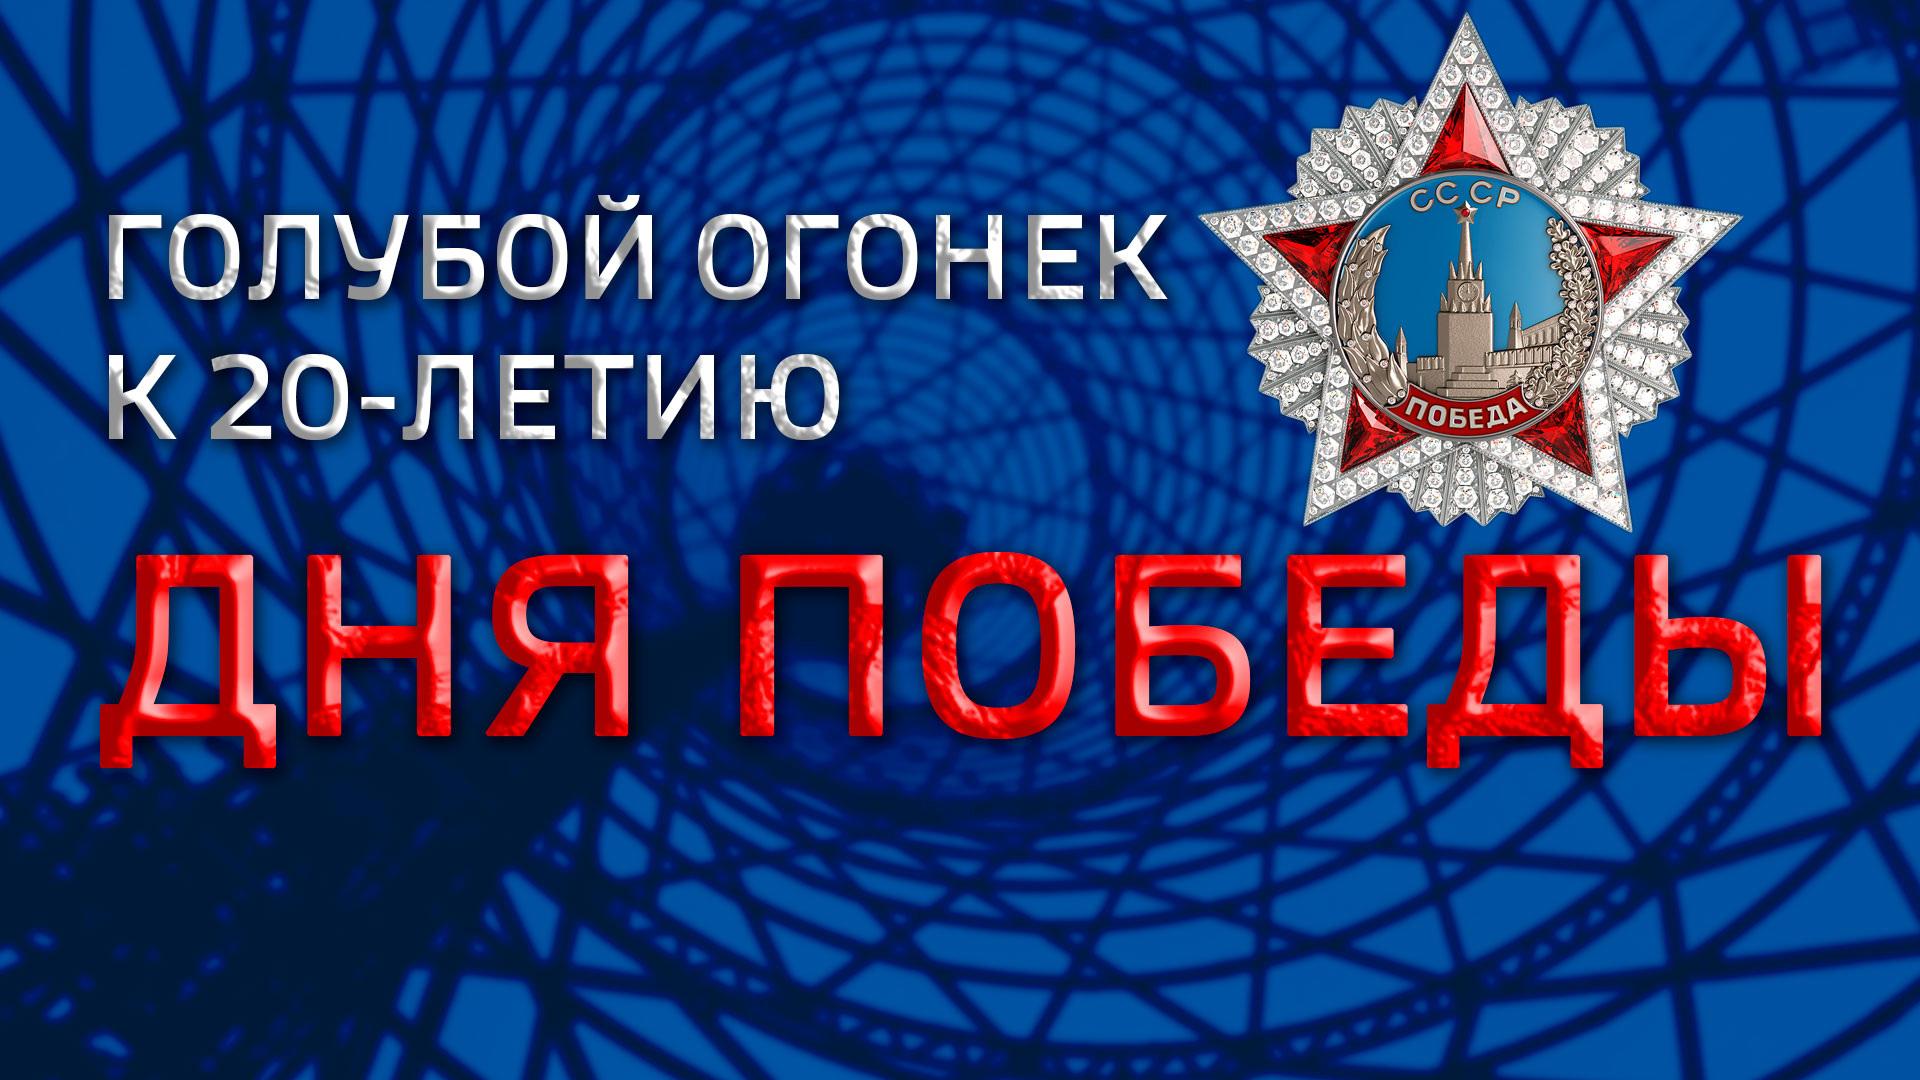 Голубой огонек к 20-летию Дня Победы